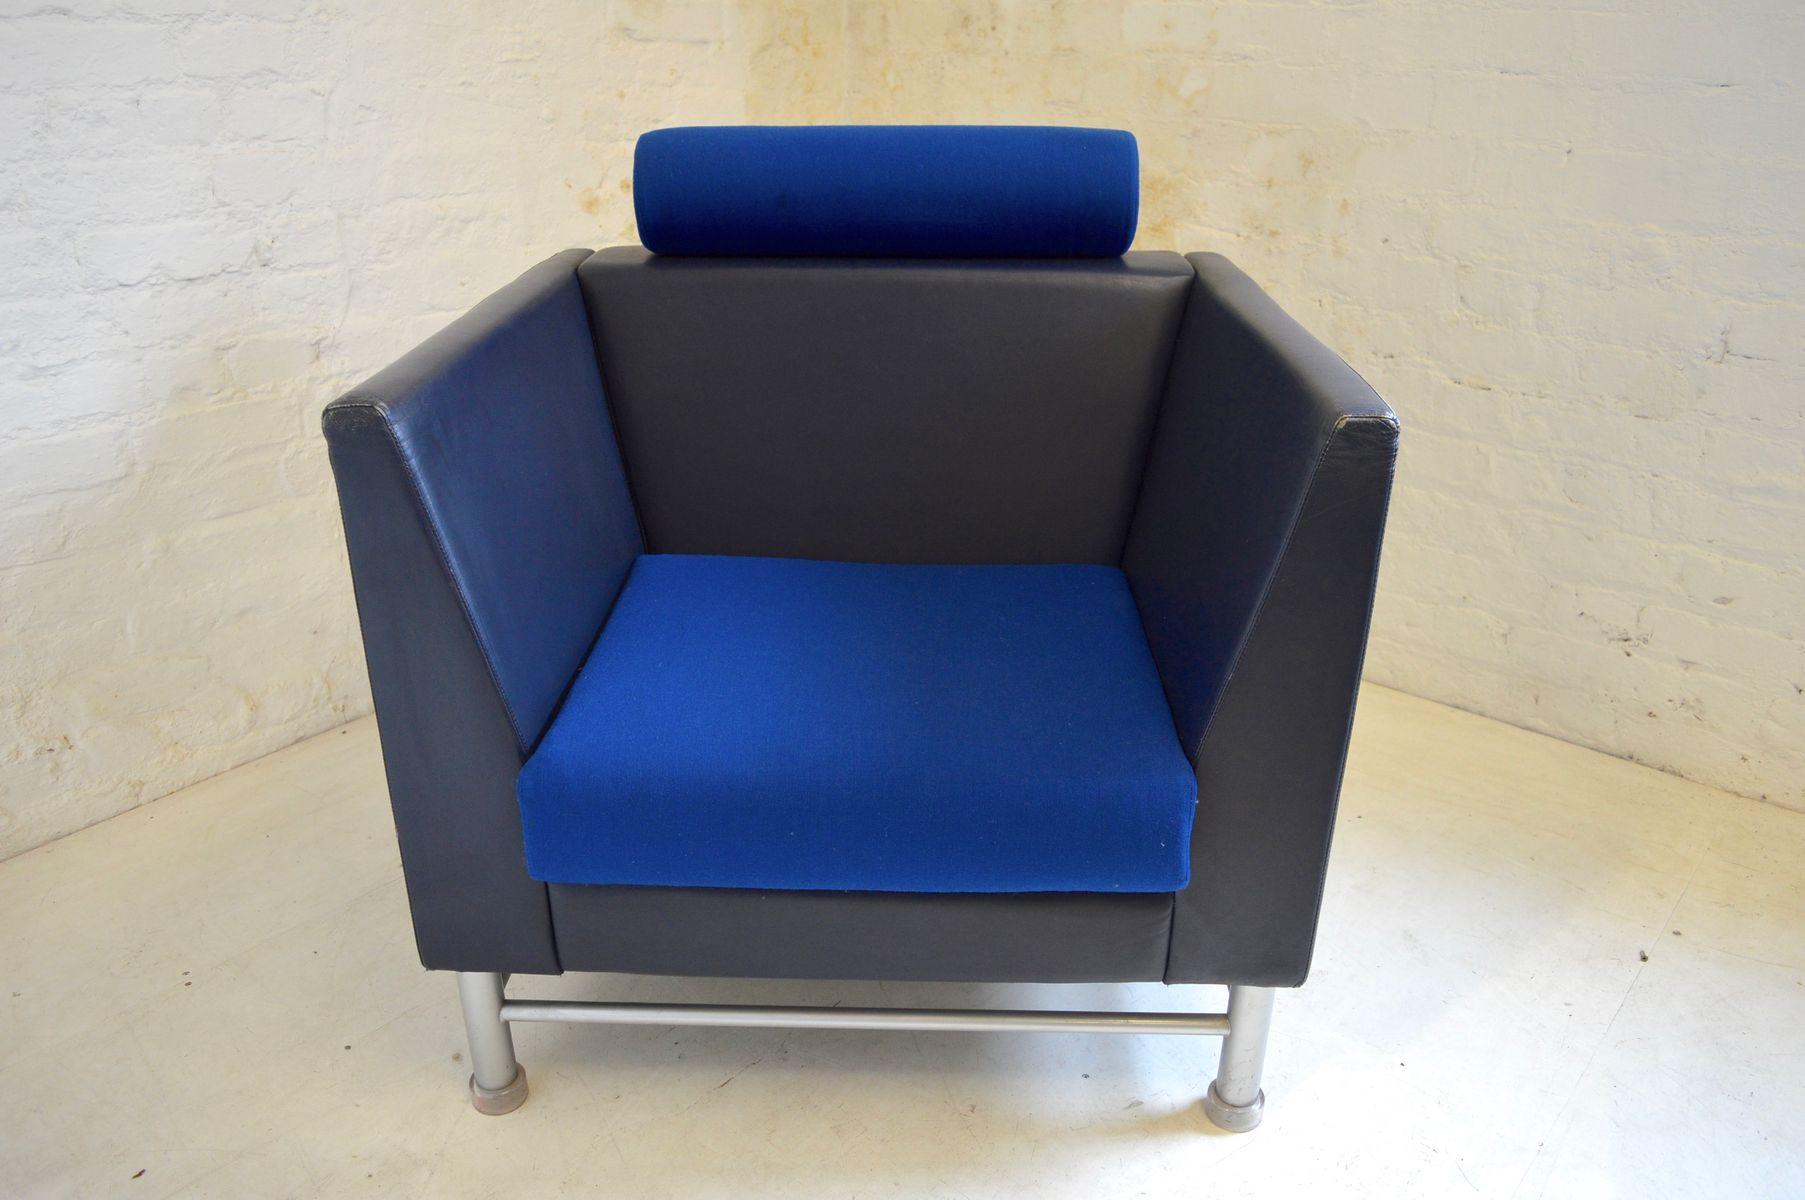 eastside modell st hle von ettore sottsass f r knoll international 1980er 2er set bei pamono. Black Bedroom Furniture Sets. Home Design Ideas